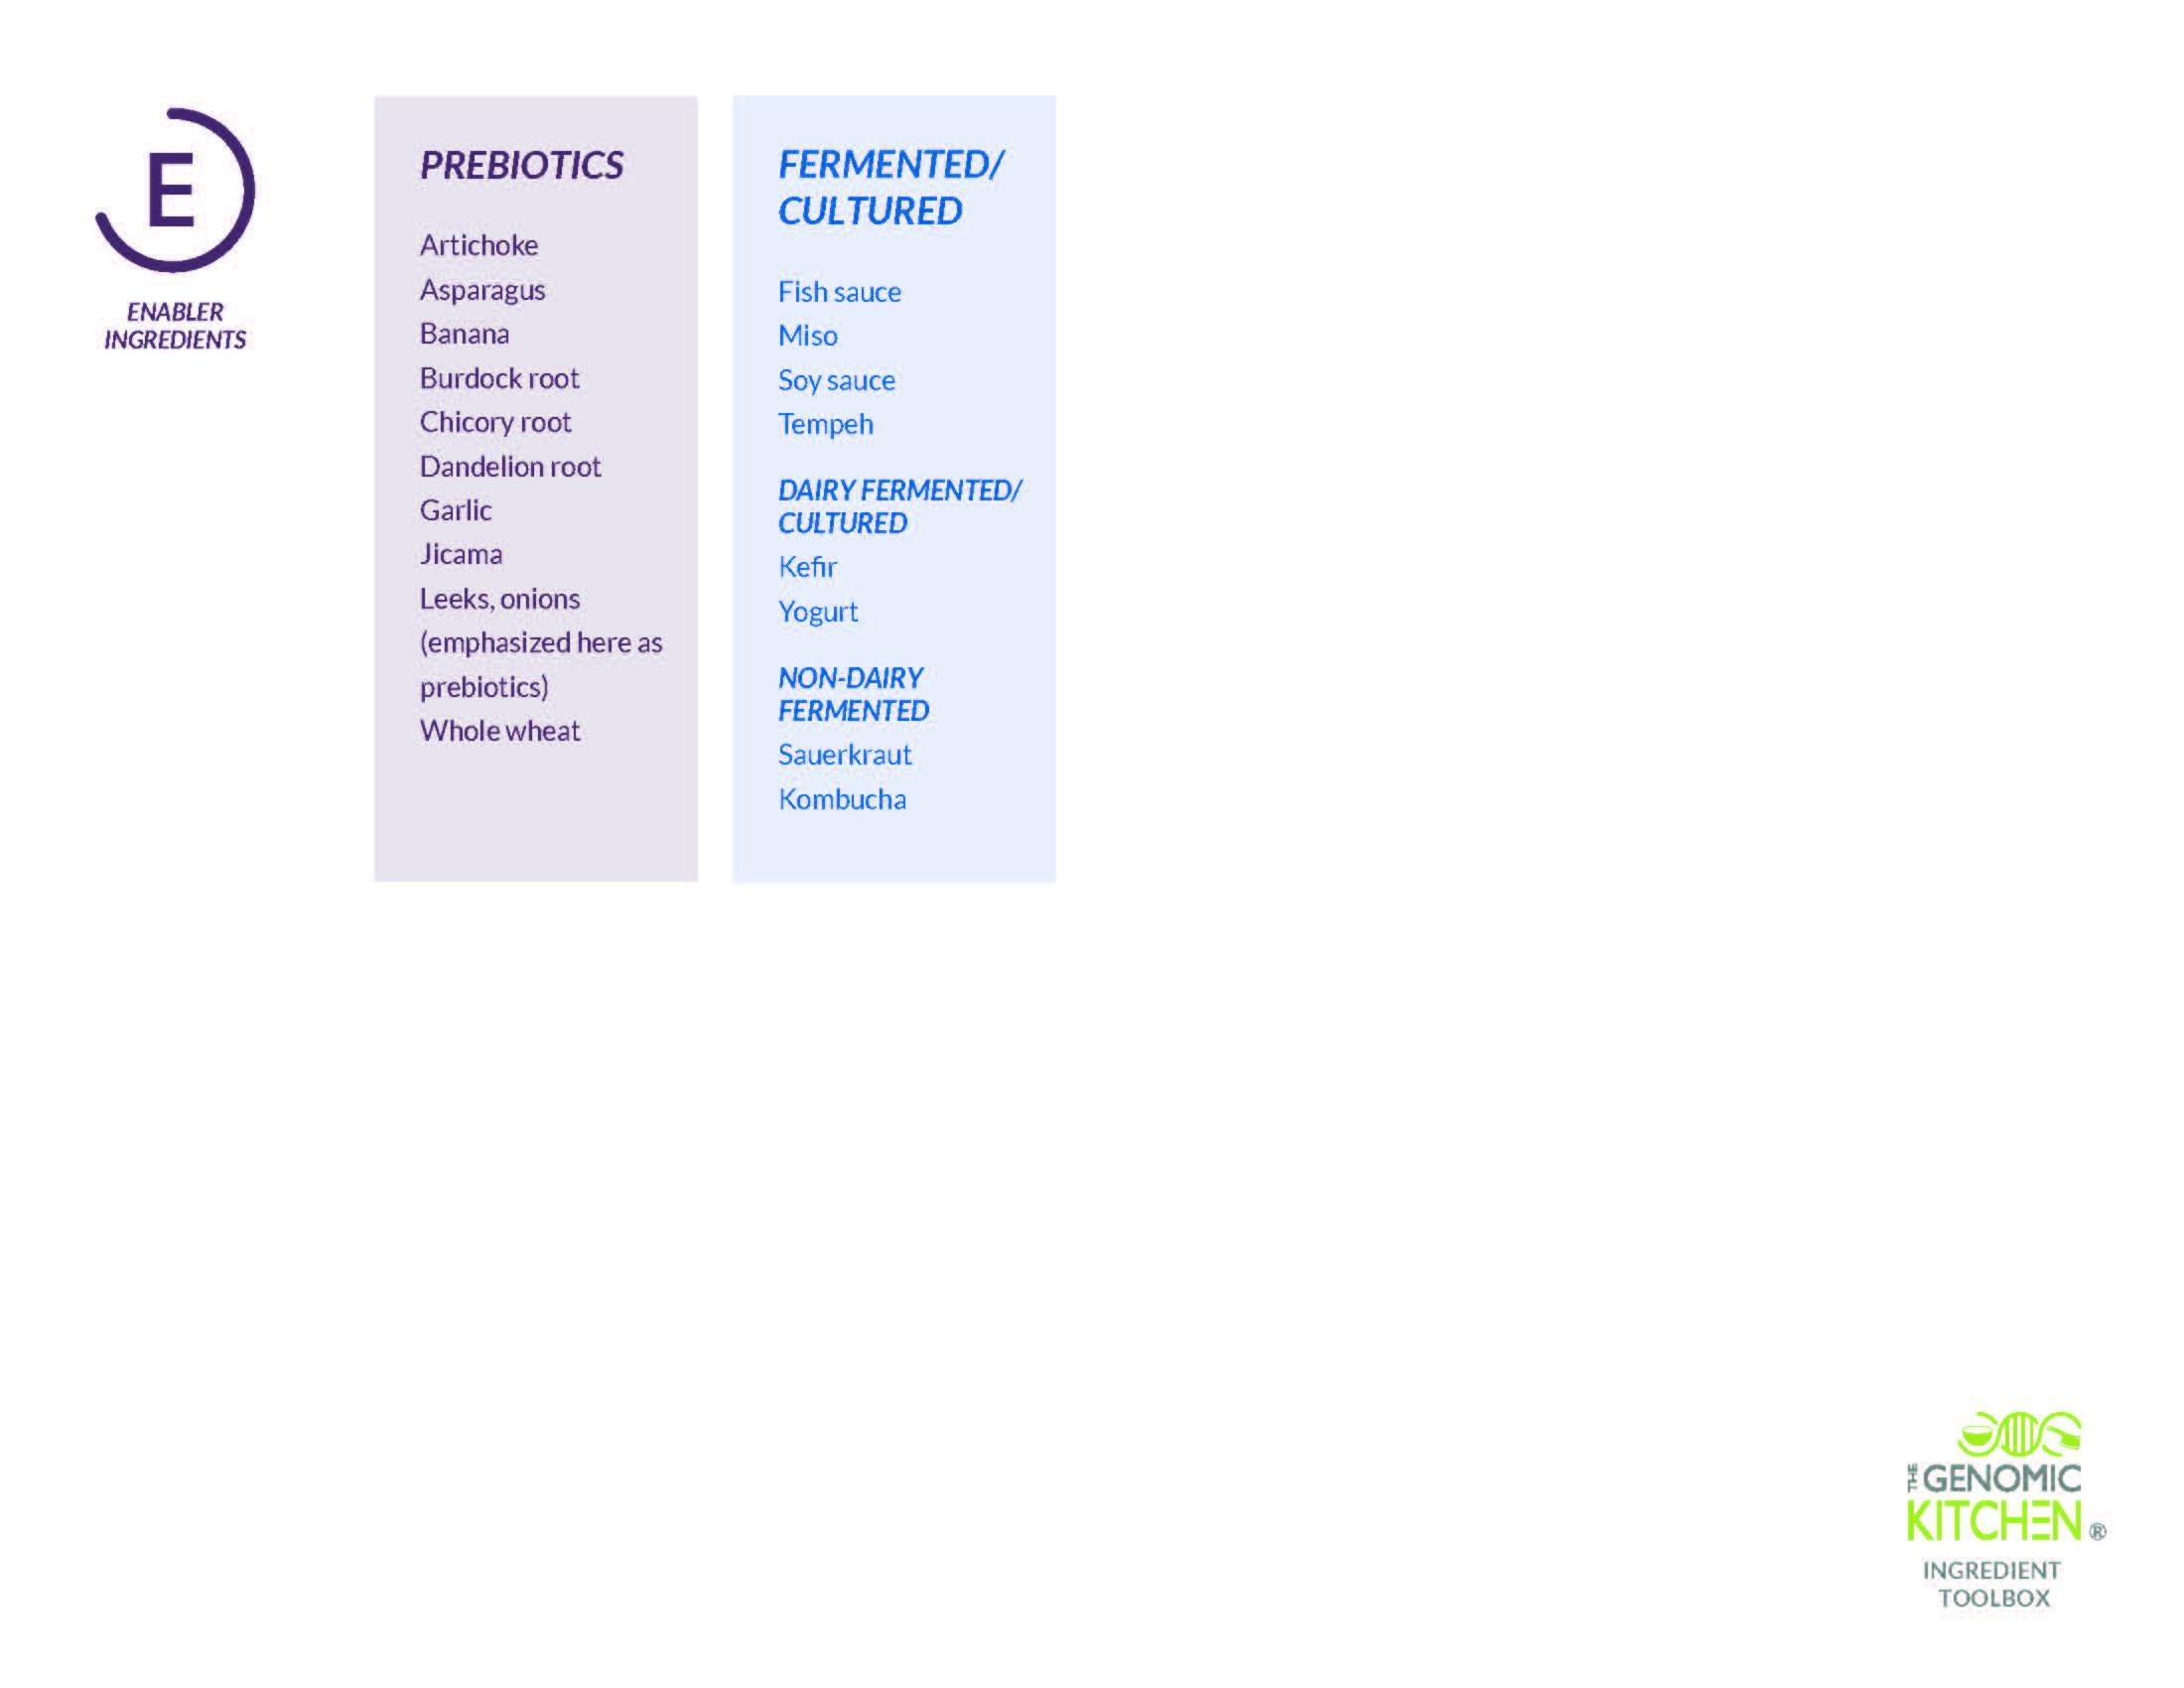 (E) Enabler Ingredients -